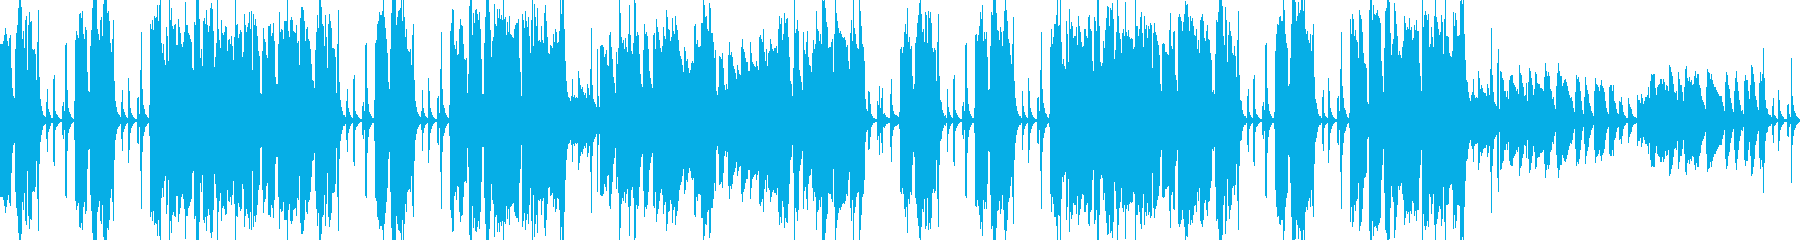 CMループ曲 軽やかマレット&クラップの再生済みの波形